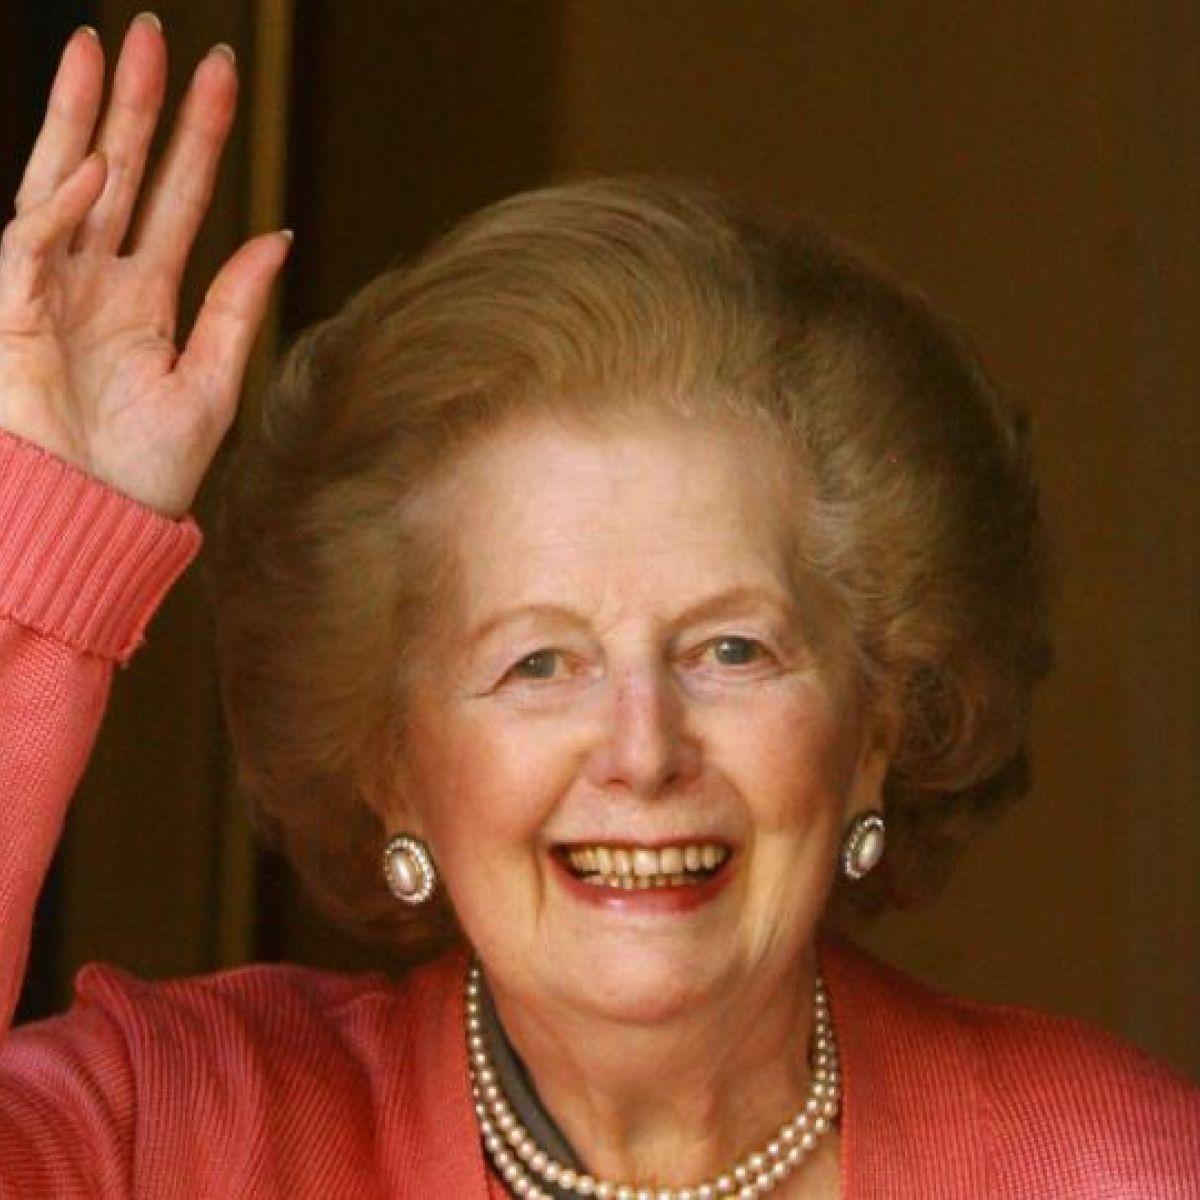 Honours of Margaret Thatcher